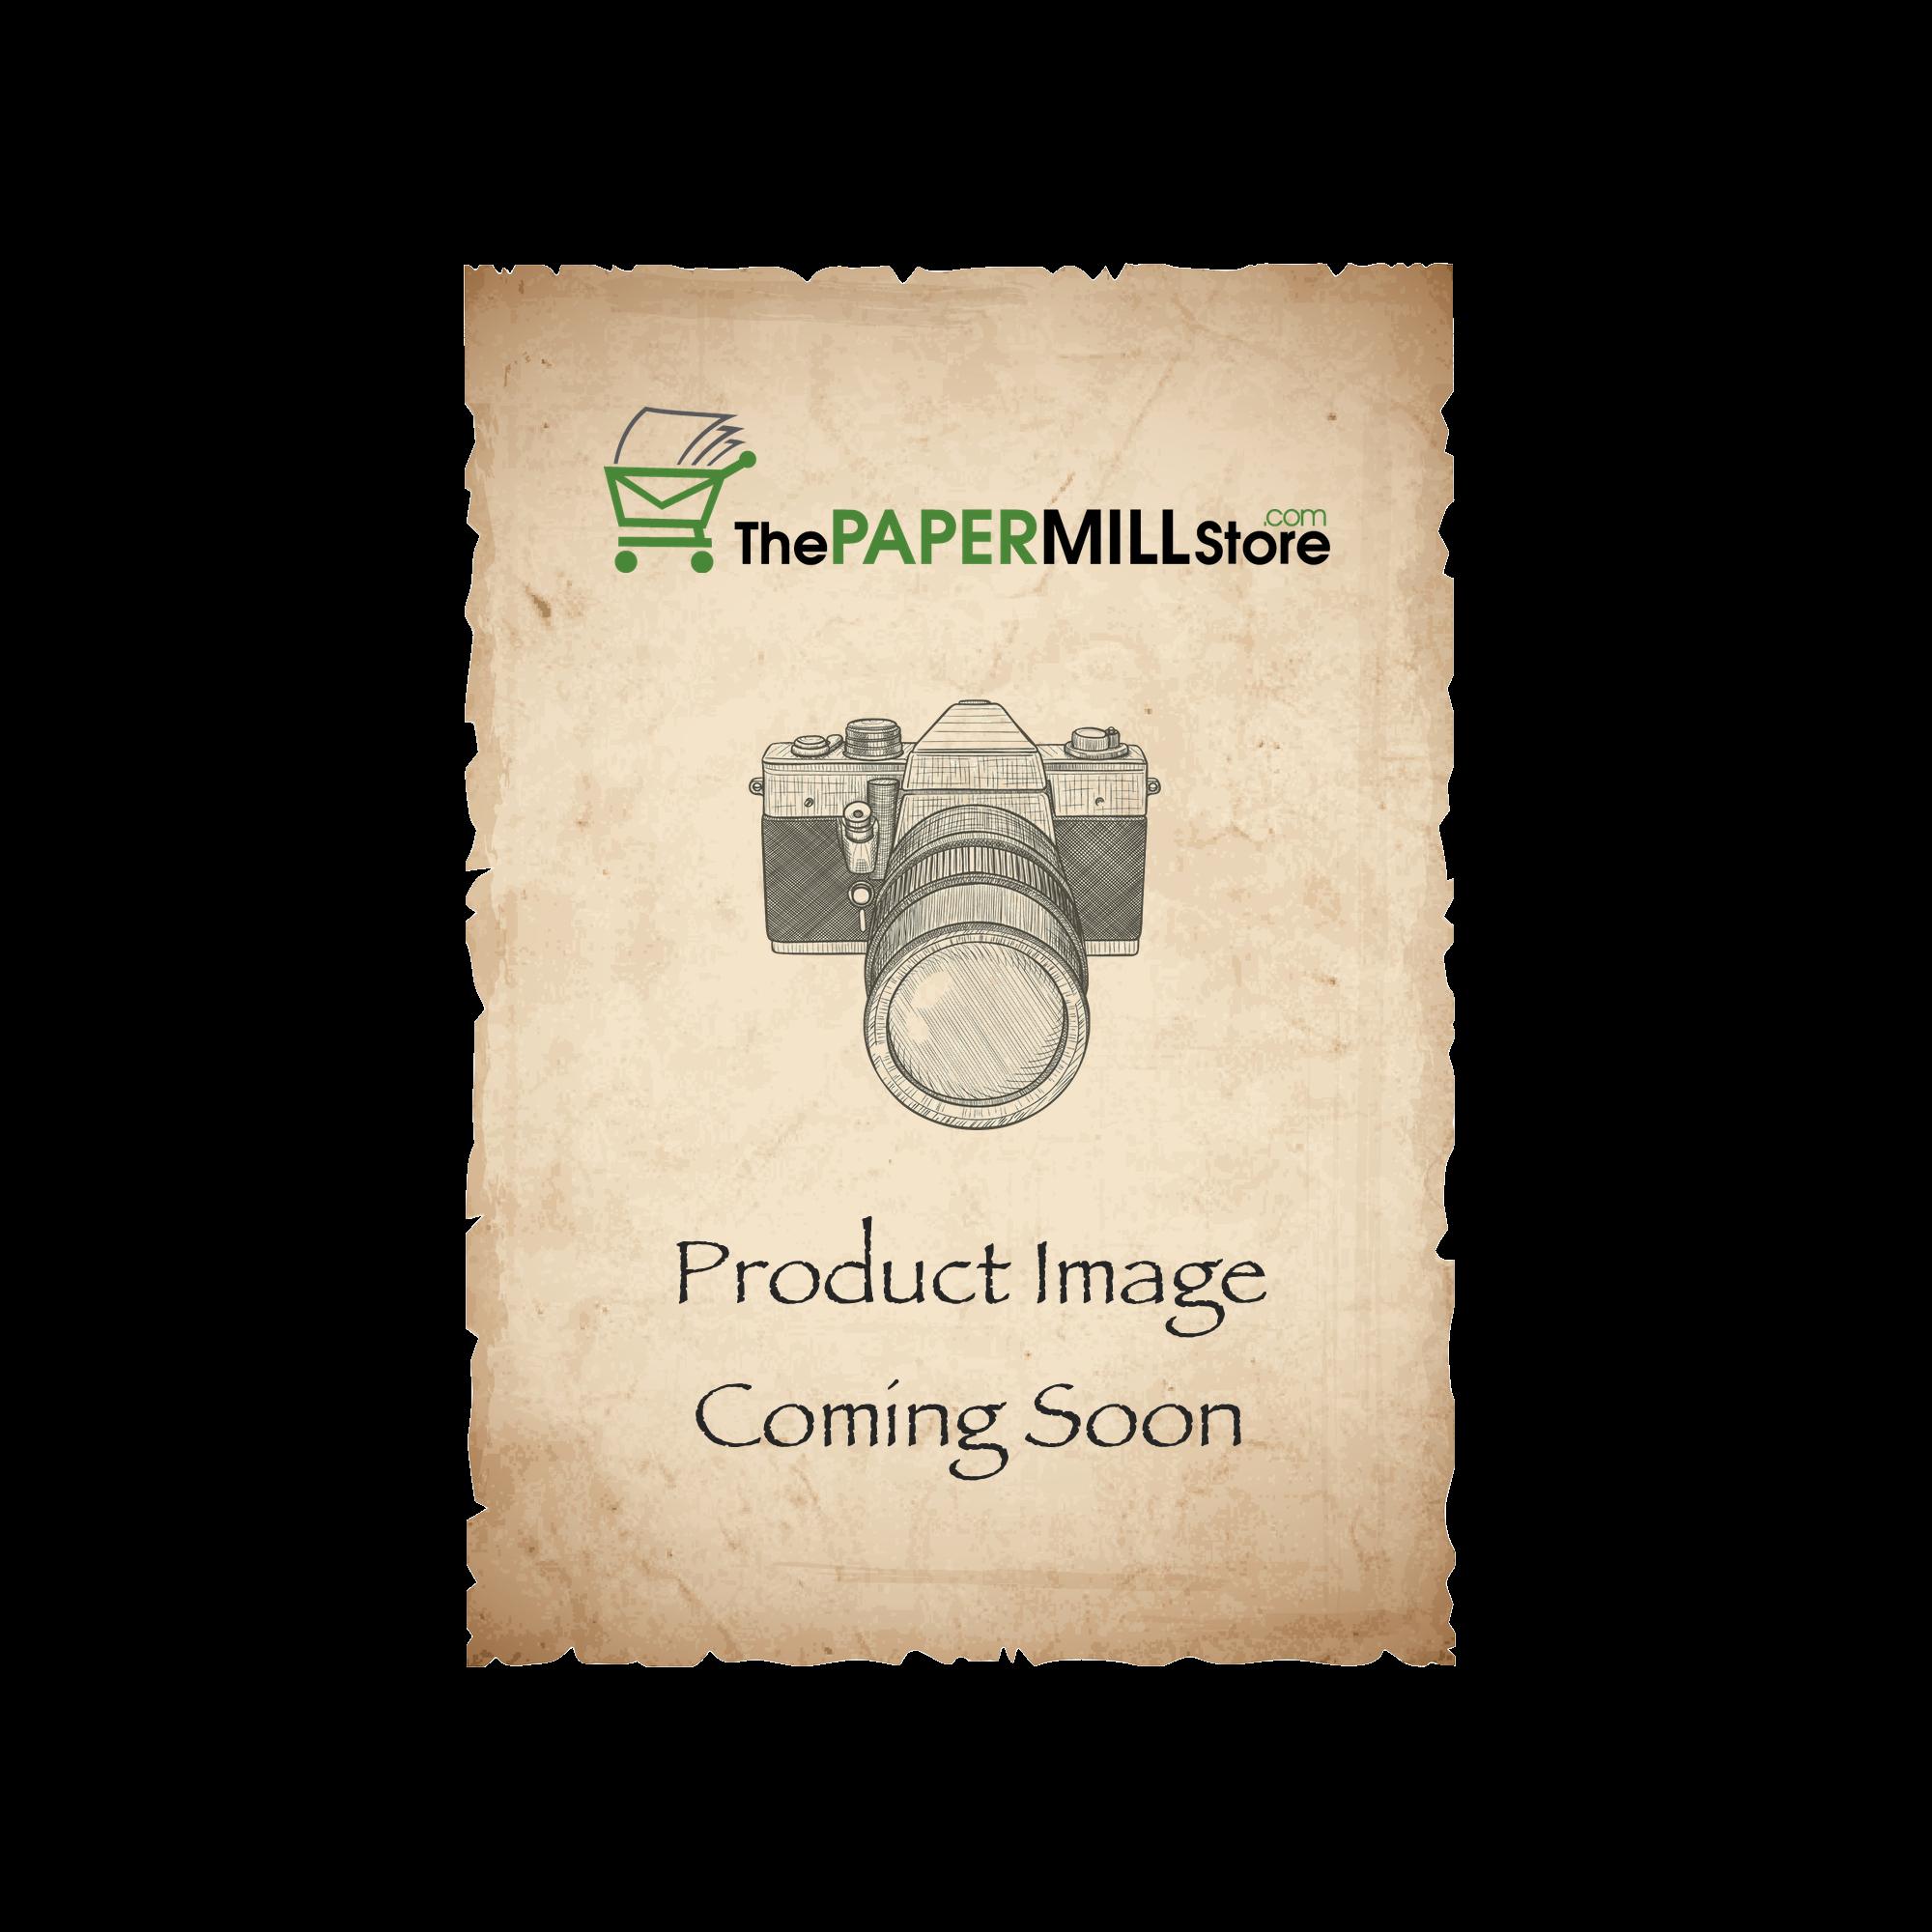 ASPIRE Petallics Beargrass Envelopes - A7 (5 1/4 x 7 1/4) 80 lb Text Metallic C/2S 30% Recycled 1000 per Carton